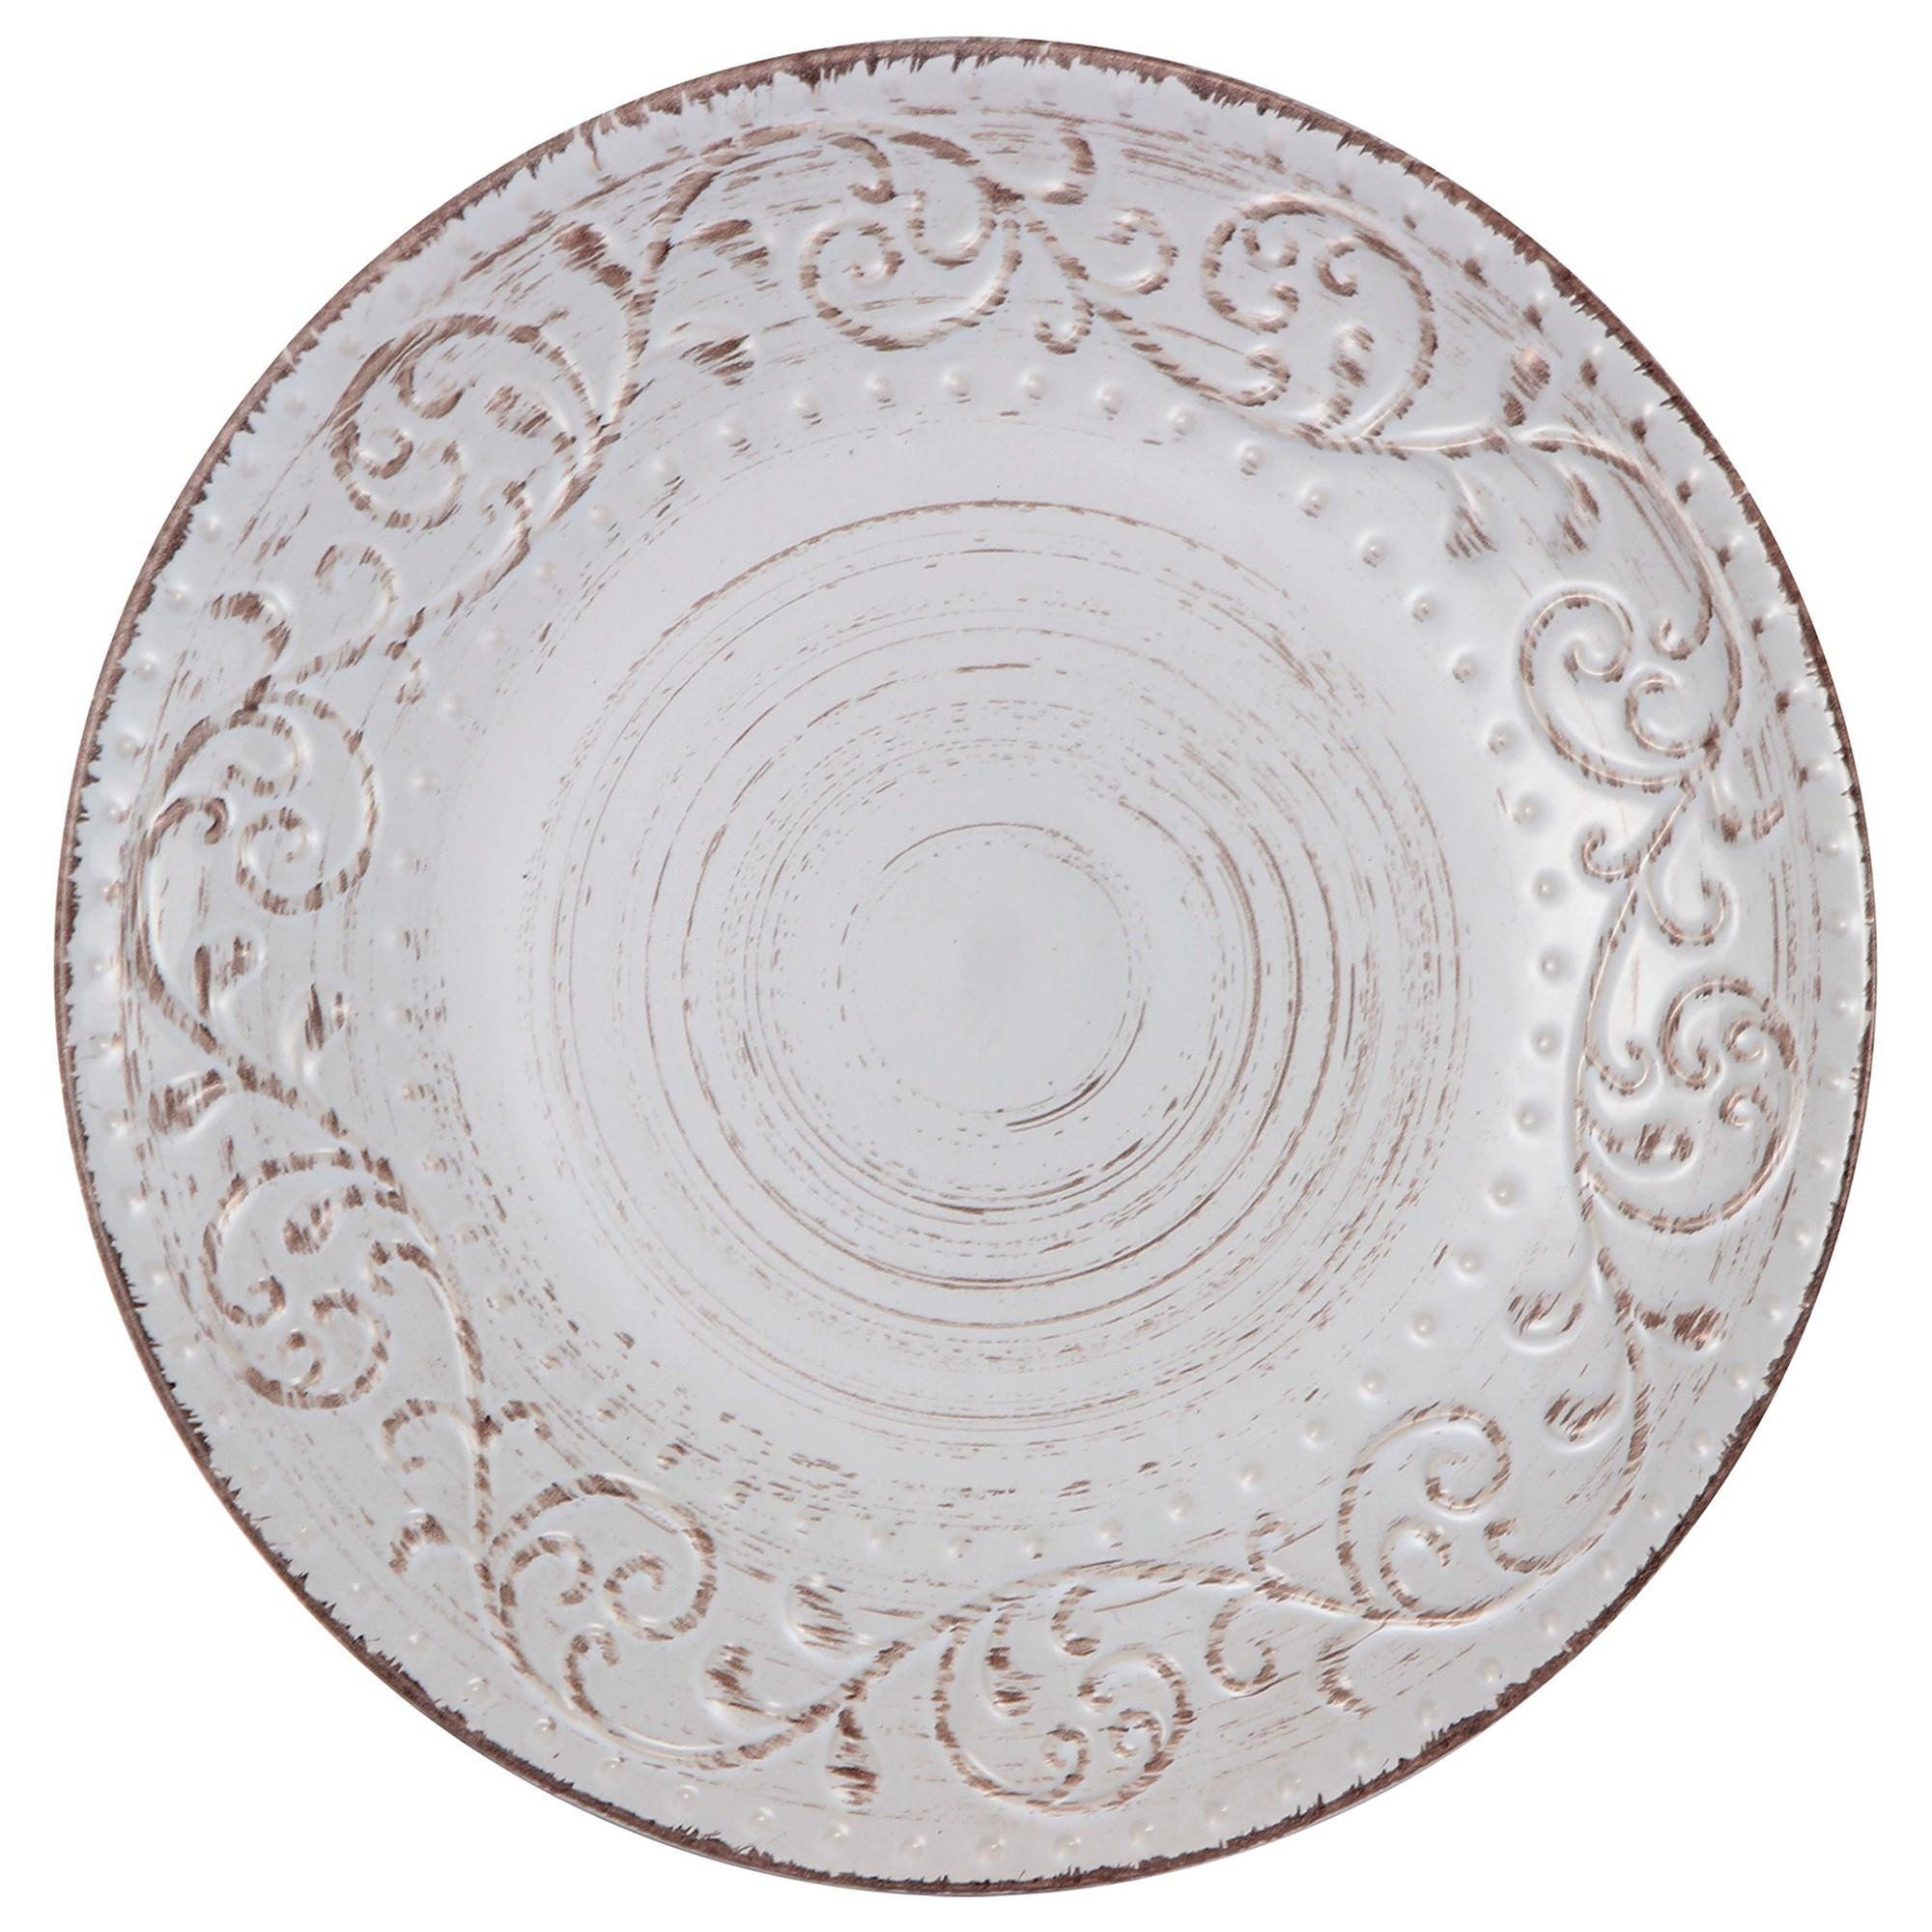 Dane Hill Stoneware Dinner Plate, Cream